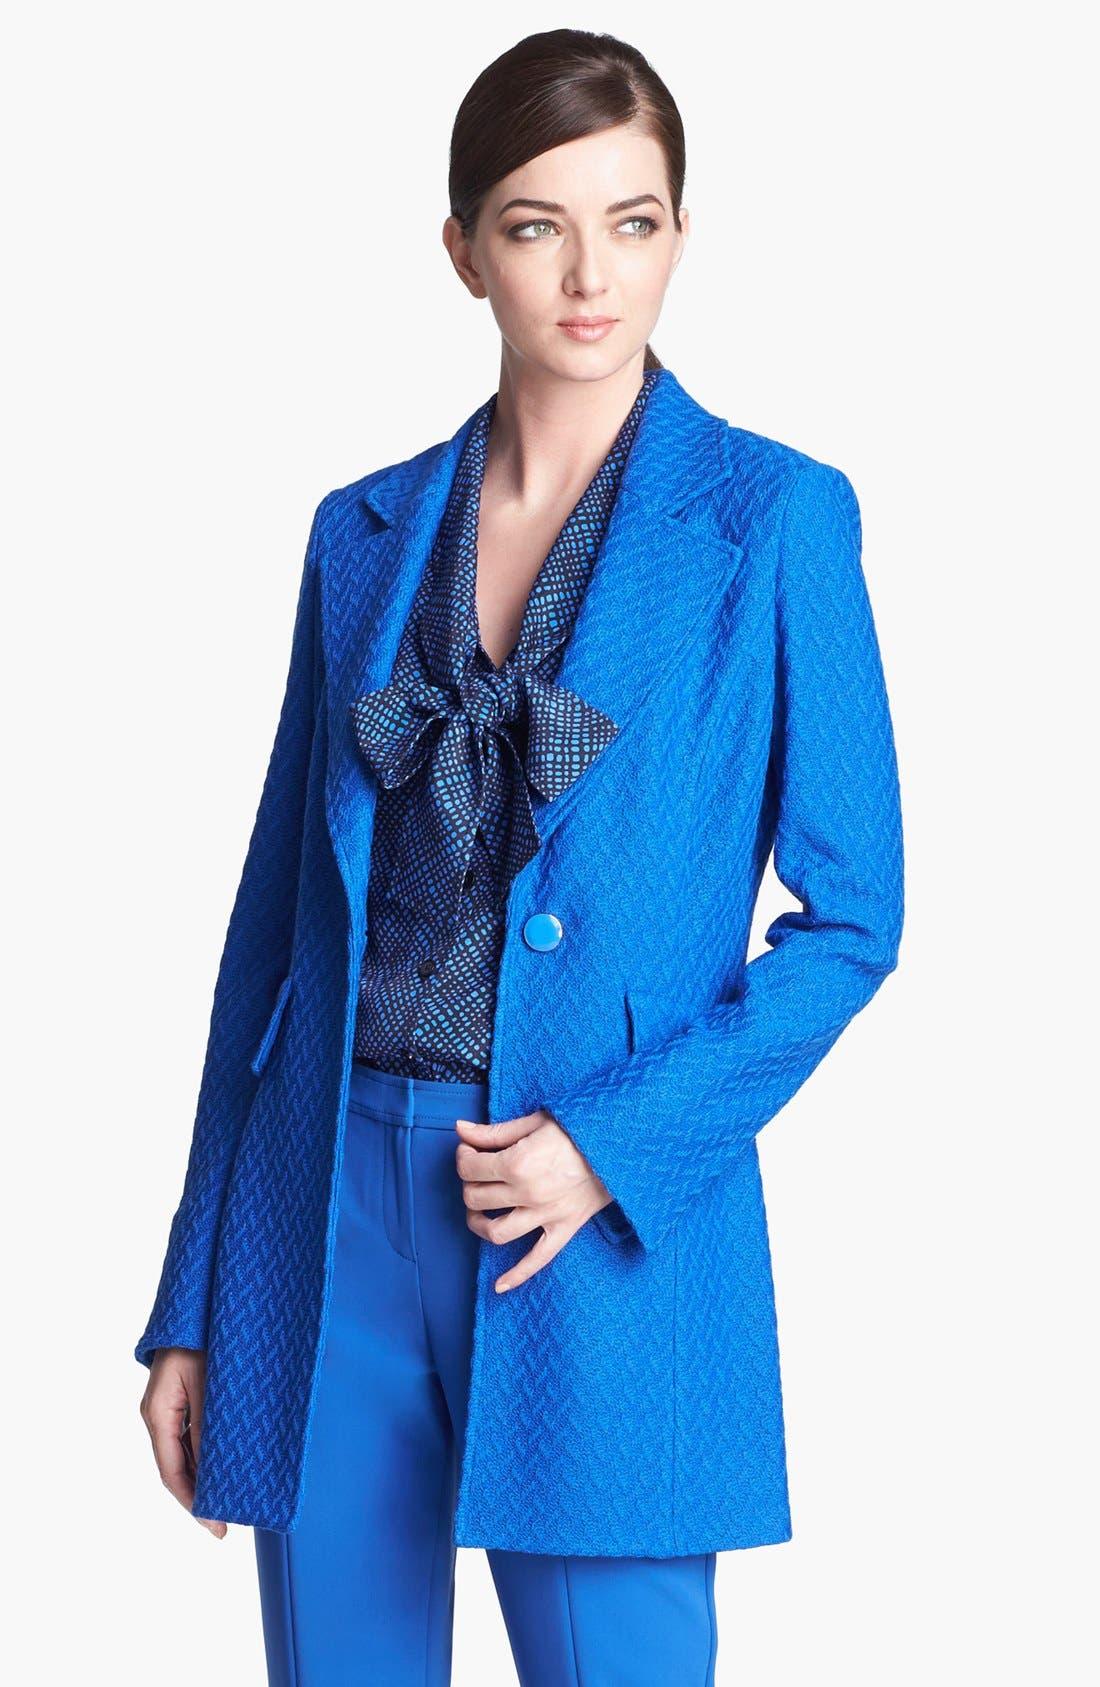 Alternate Image 1 Selected - St. John Collection Long Twist Tweed Jacket